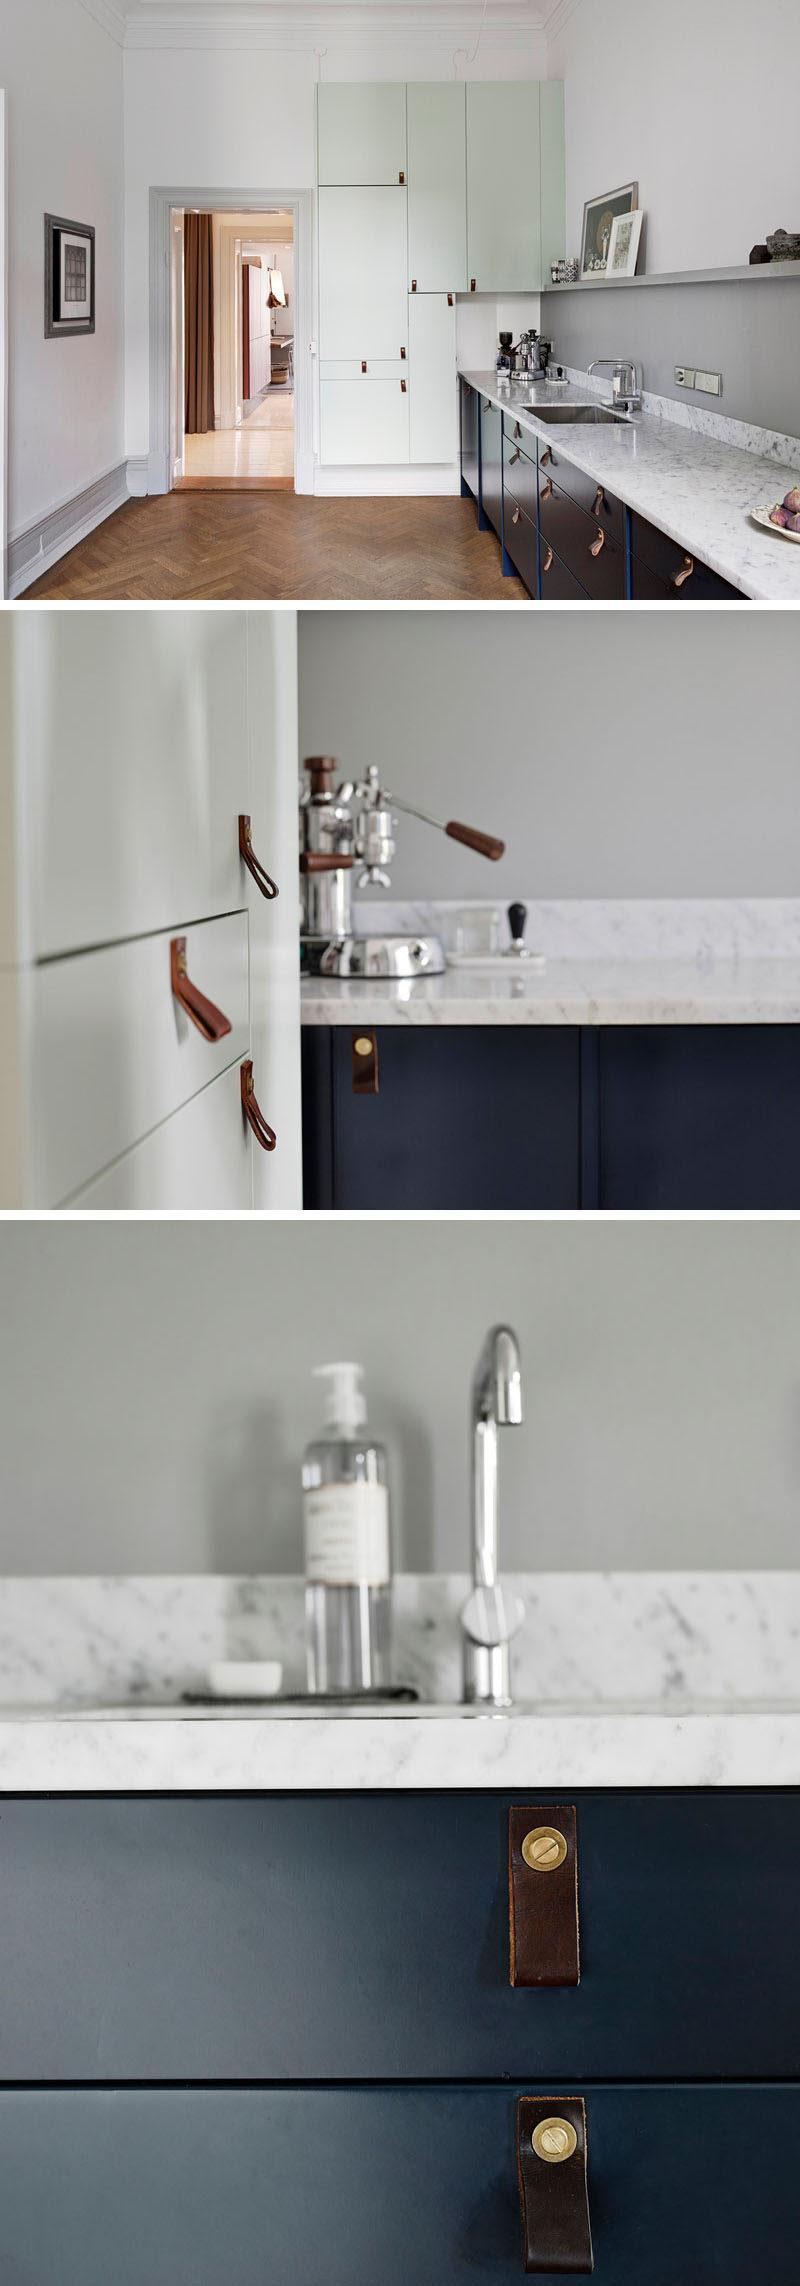 Kitchen Design Idea - Cabinet Hardware Alternatives | CONTEMPORIST